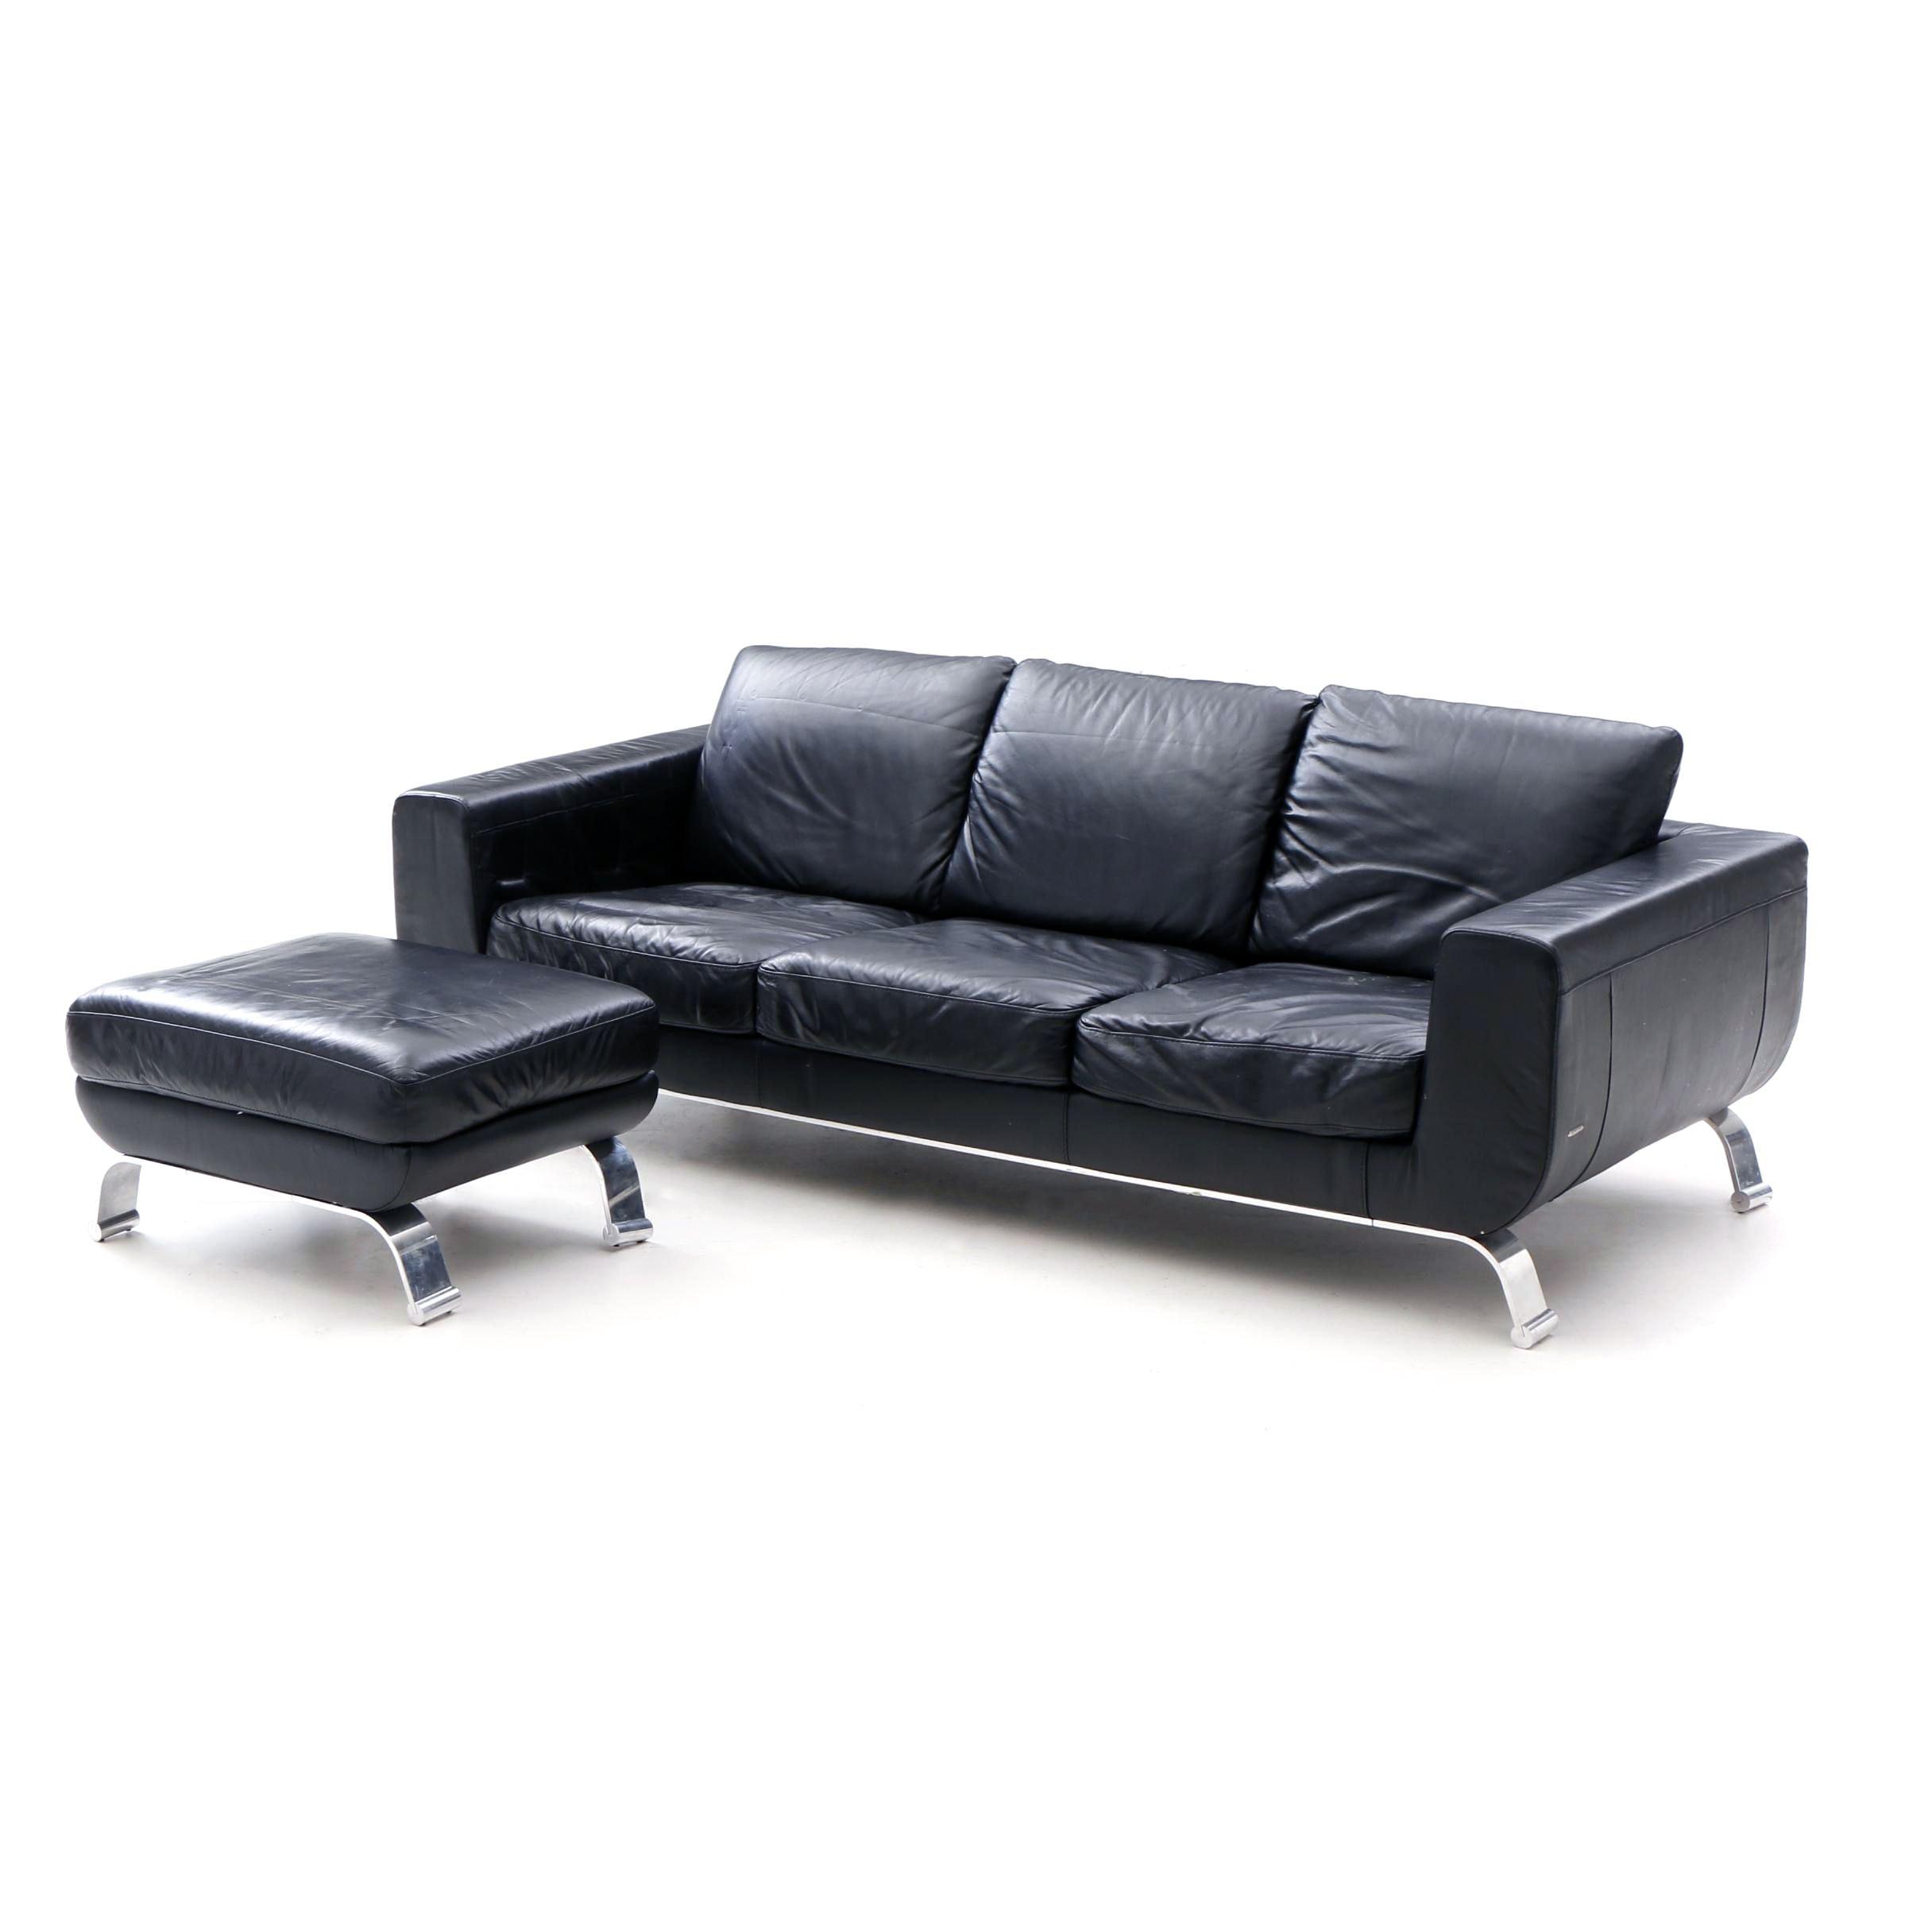 Contemporary Italian Black Leather Sofa by Natuzzi